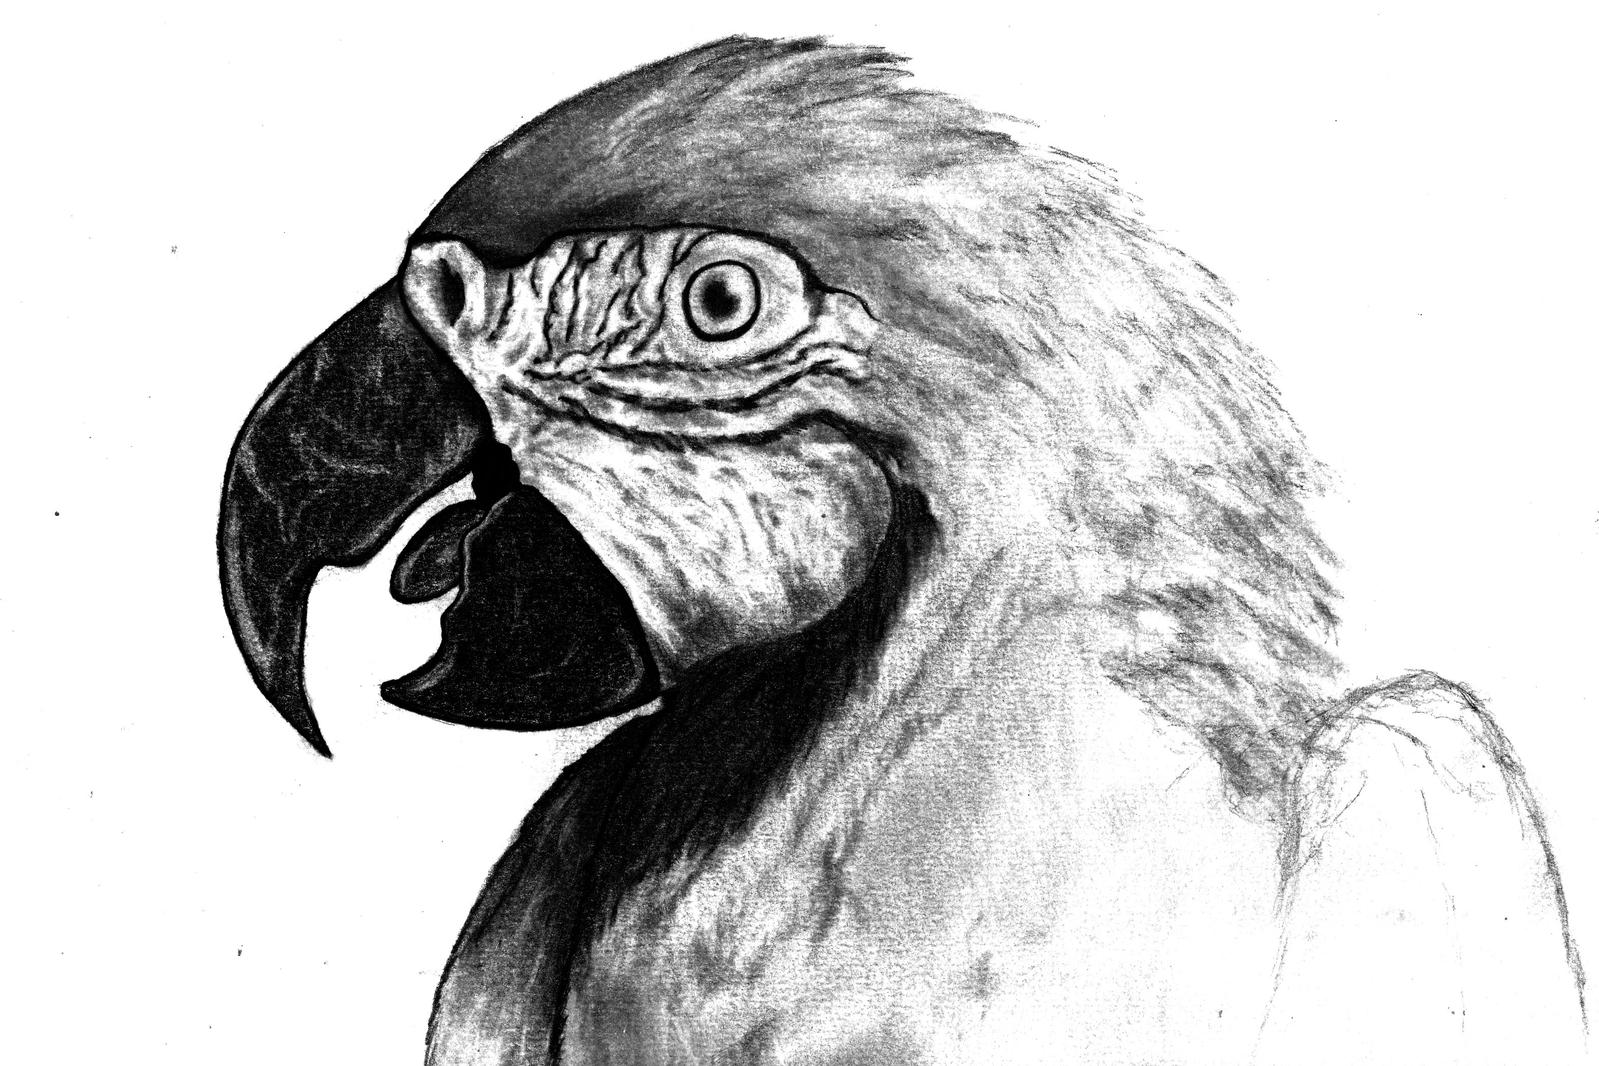 parrot made by pencil by leonardoalves94 on deviantart